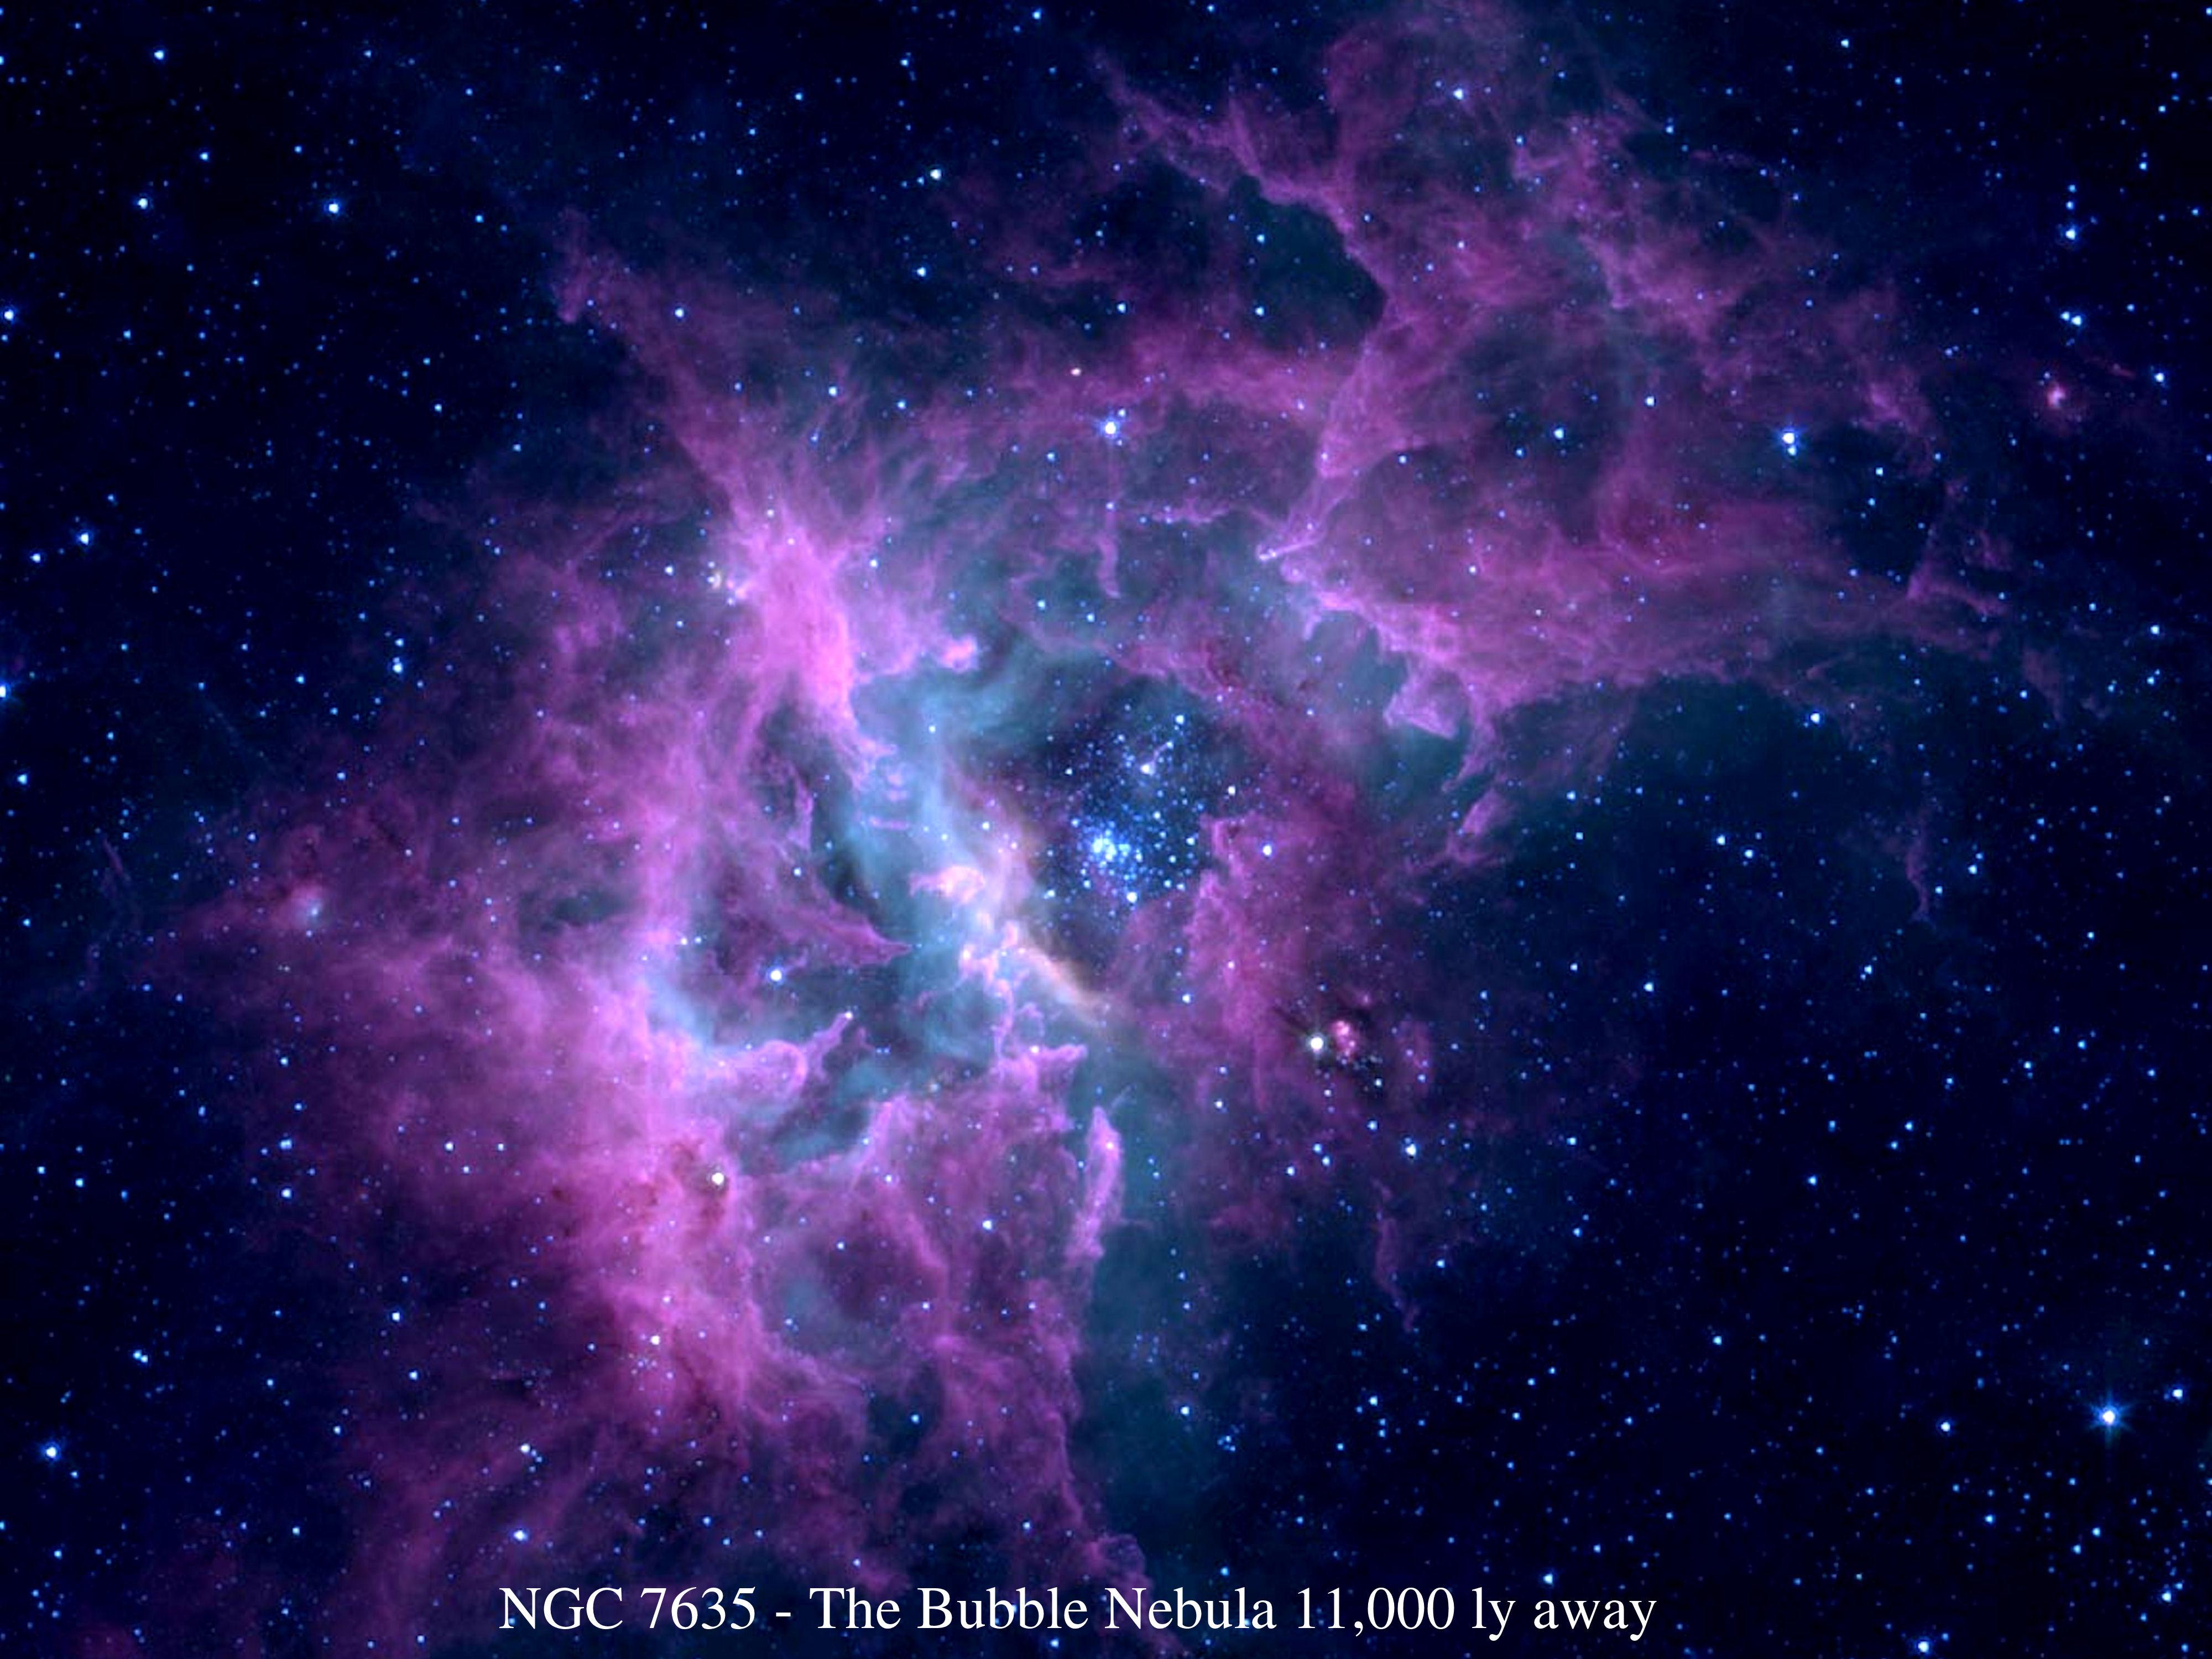 nebula full screen wallpaper 26 15 other nebula wide screen 4000x3000